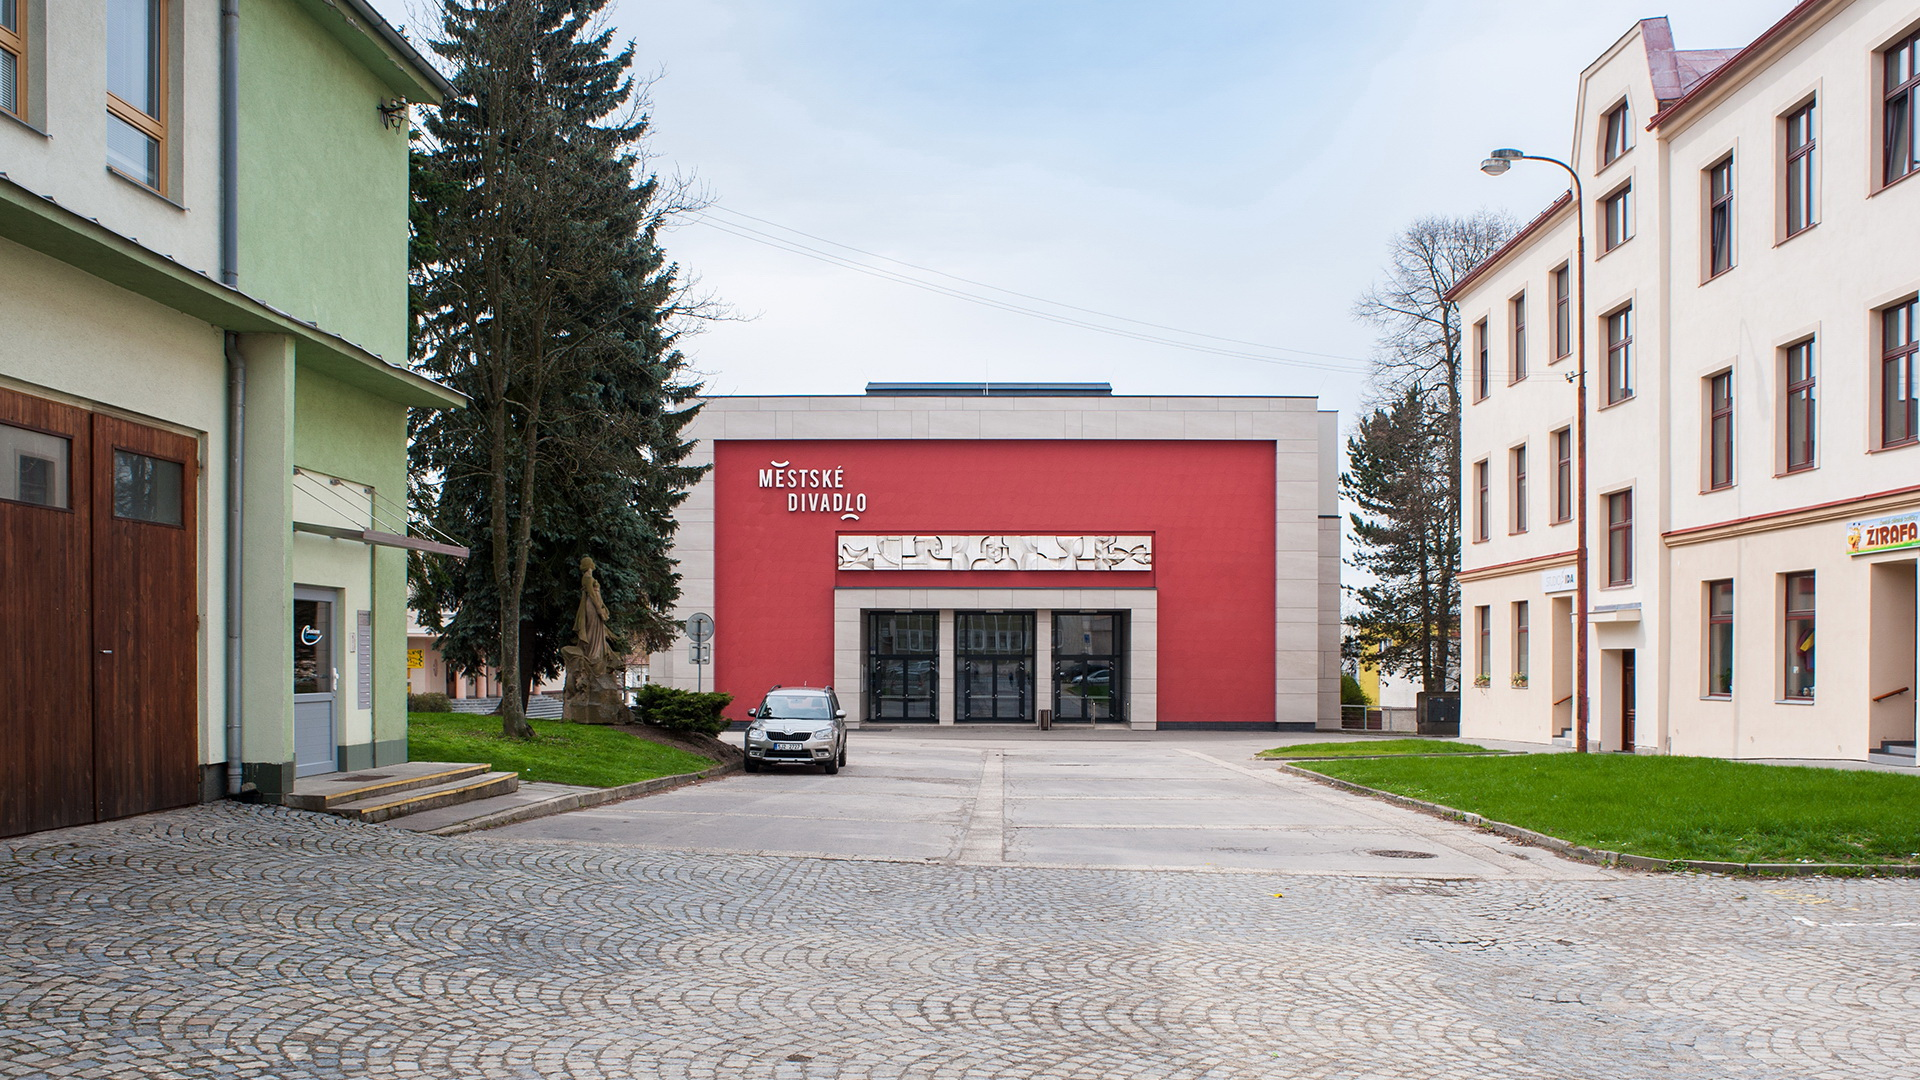 Theatre Zdar nad Sazavou - Theatre Zdar nad Sazavou